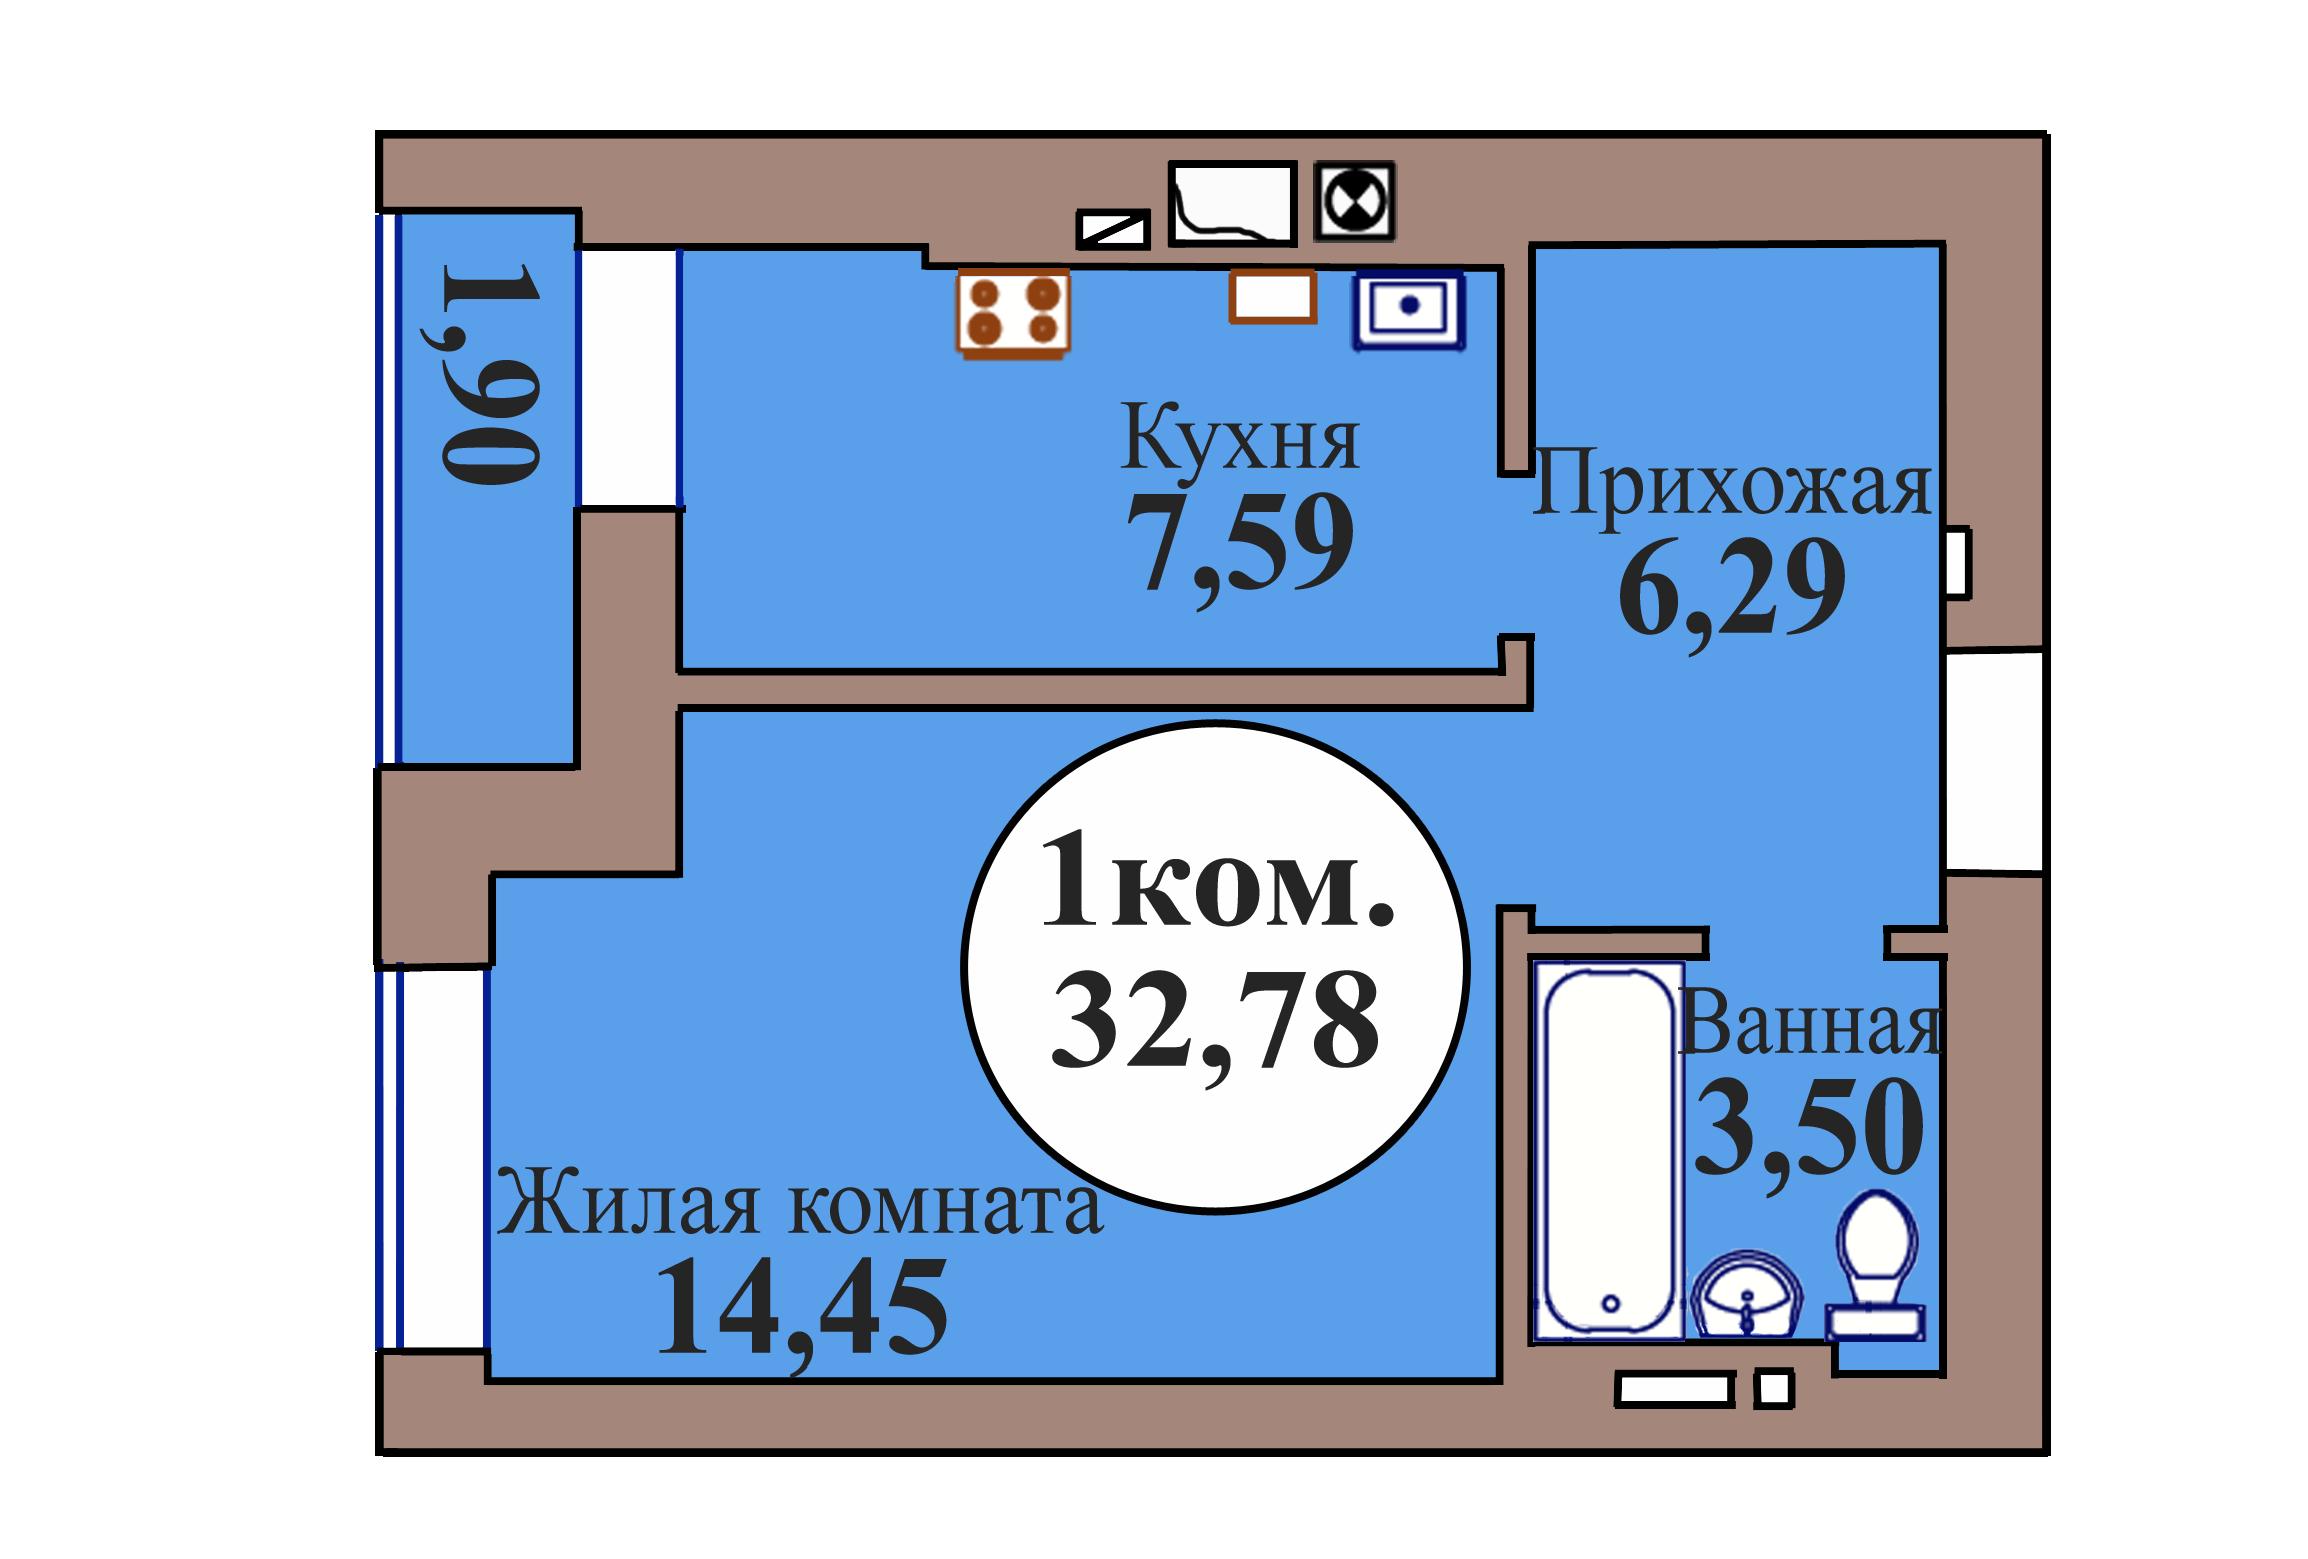 1-комн. кв. по пер. Калининградский, 5 кв. 94 в Калининграде